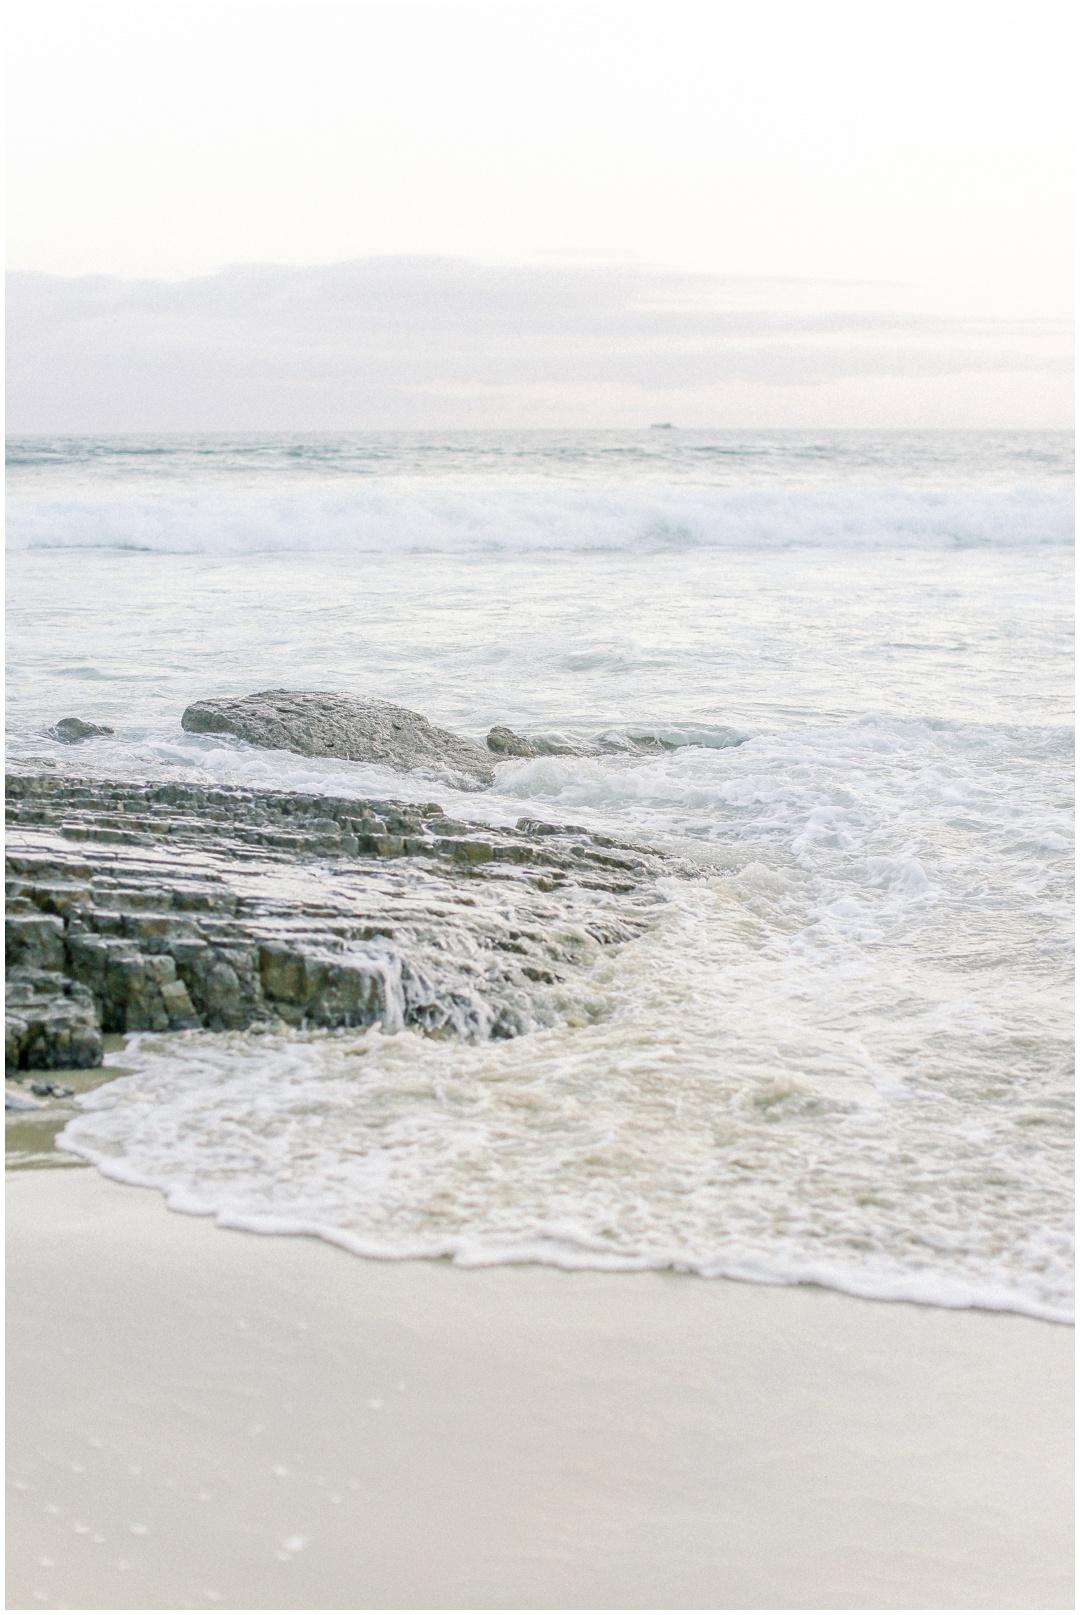 Newport_Beach_Newborn_Light_Airy_Natural_Photographer_Newport_Beach_Photographer_Orange_County_Family_Photographer_Cori_Kleckner_Photography_Newport_Beach_Photographer_Maternity_kole_calhoun56_kole_calhoun_Jennifer_Calhoun_Knox_Calhoun_3721.jpg